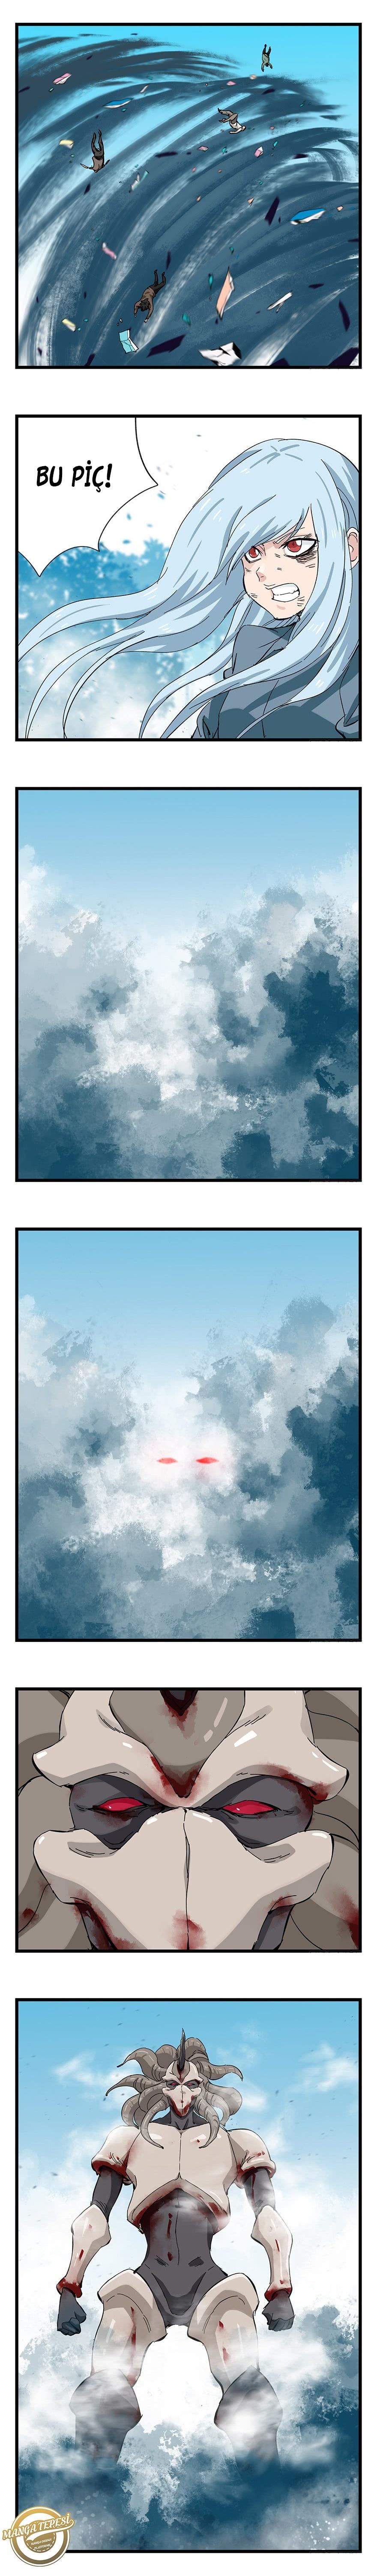 tower-into-the-cloudsbolum-105